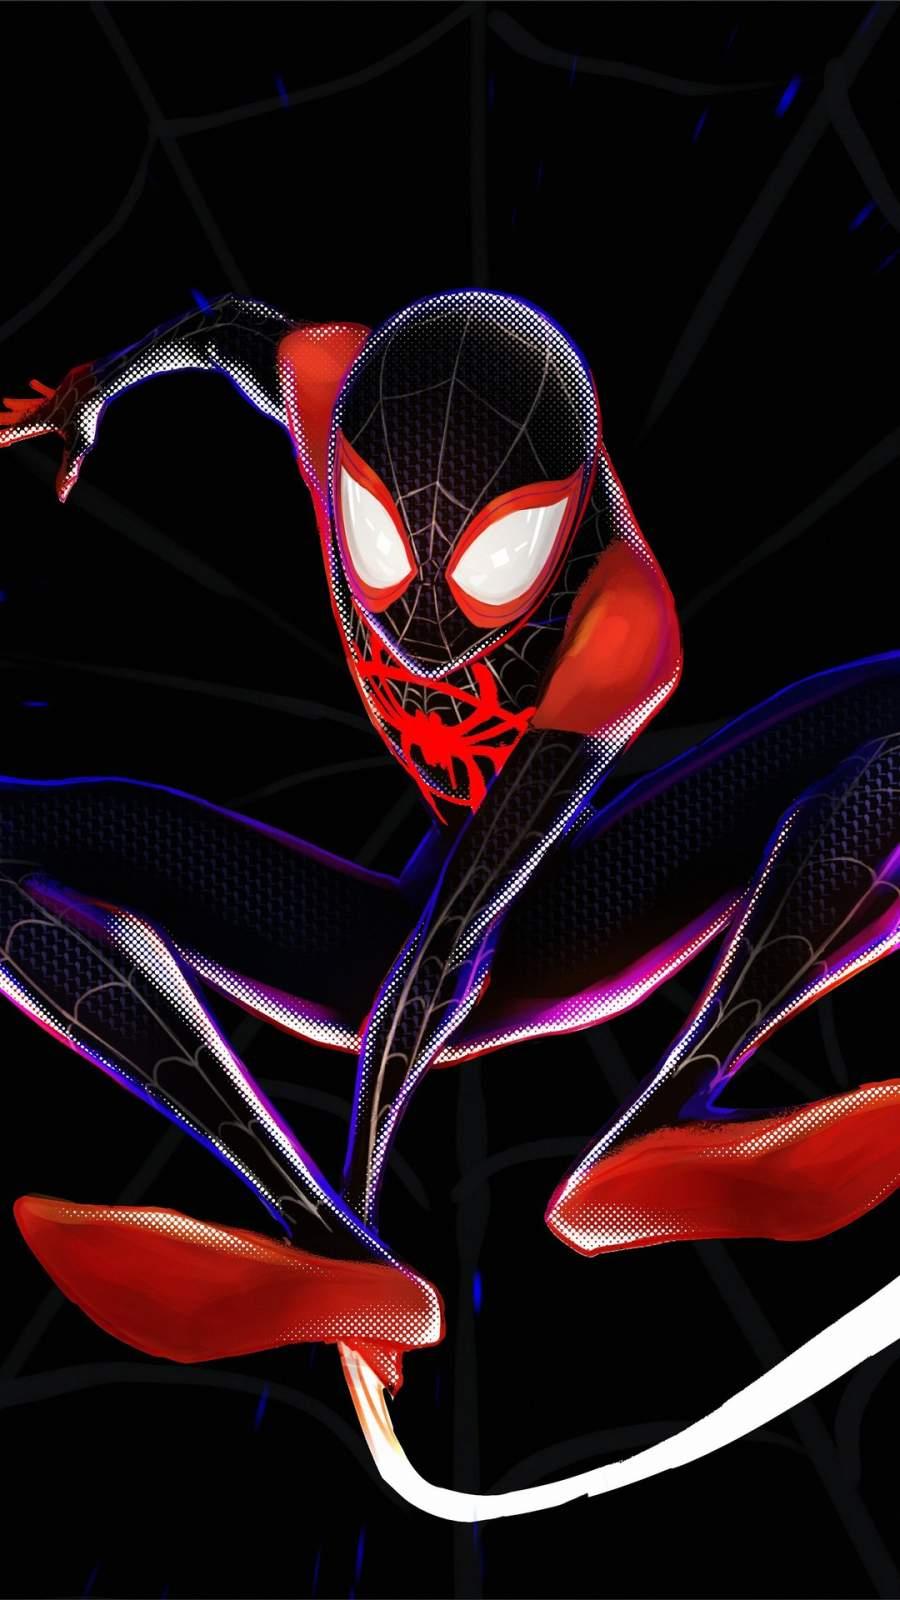 Spiderman 4k Miles Morales iPhone Wallpaper